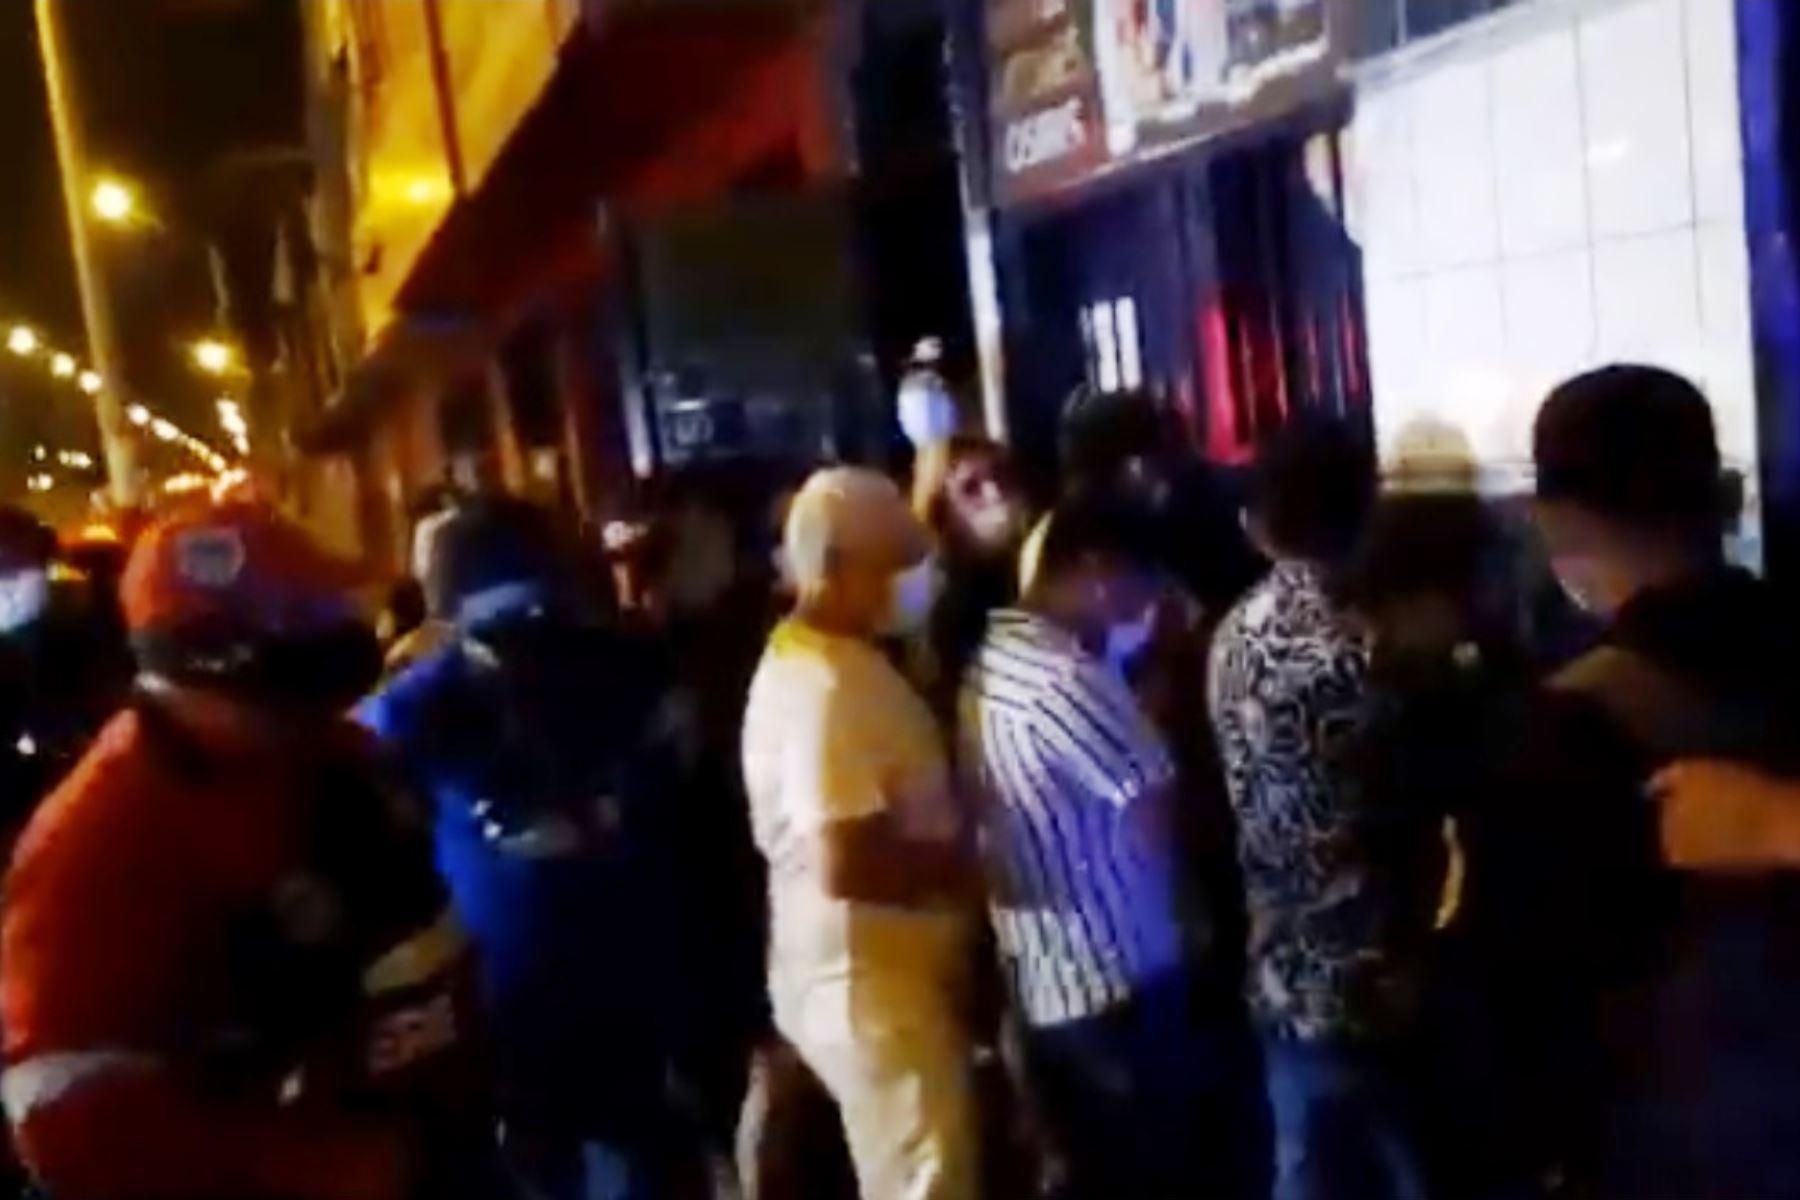 San Martin de Porres: Policía interviene a 150 personas en discoteca clandestina. Foto: ANDINA/capturaTV.